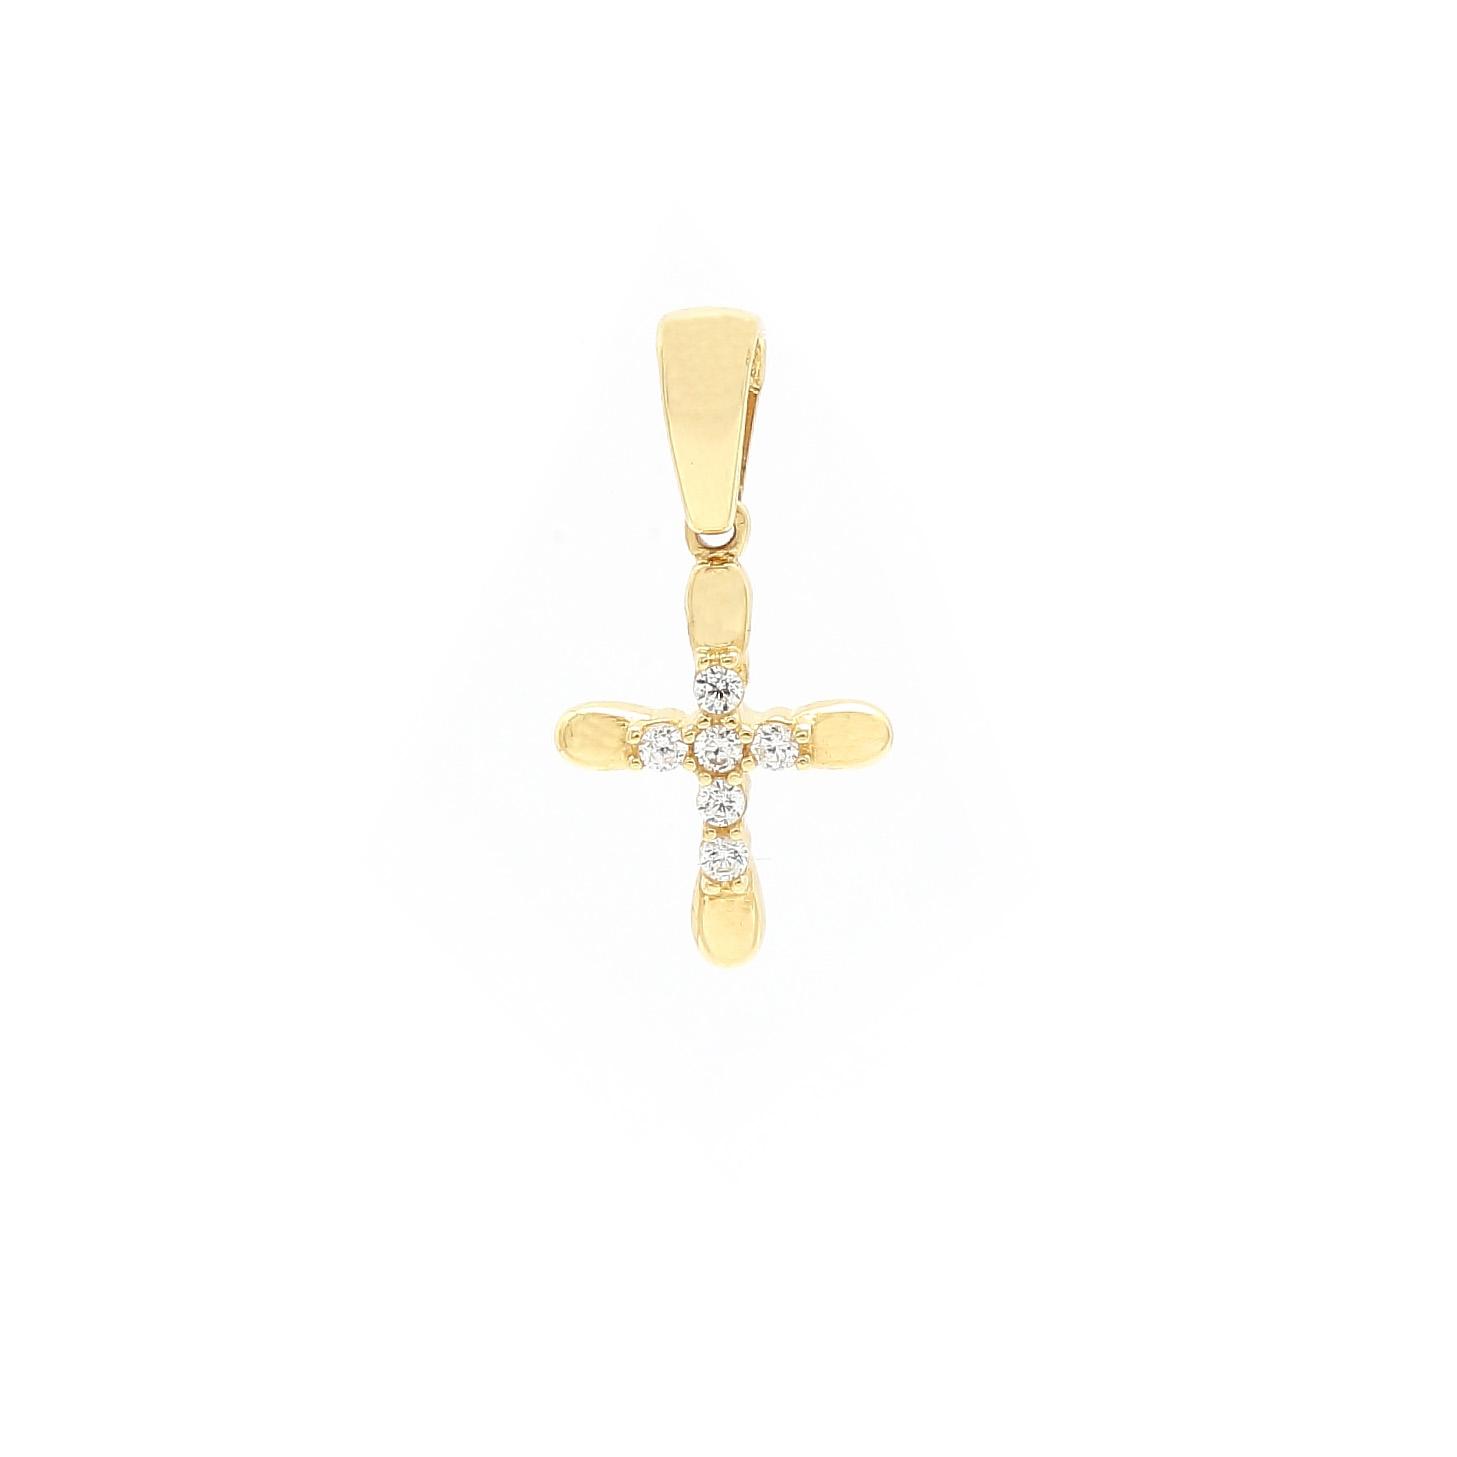 Malý zlatý krížik so zirkónmi